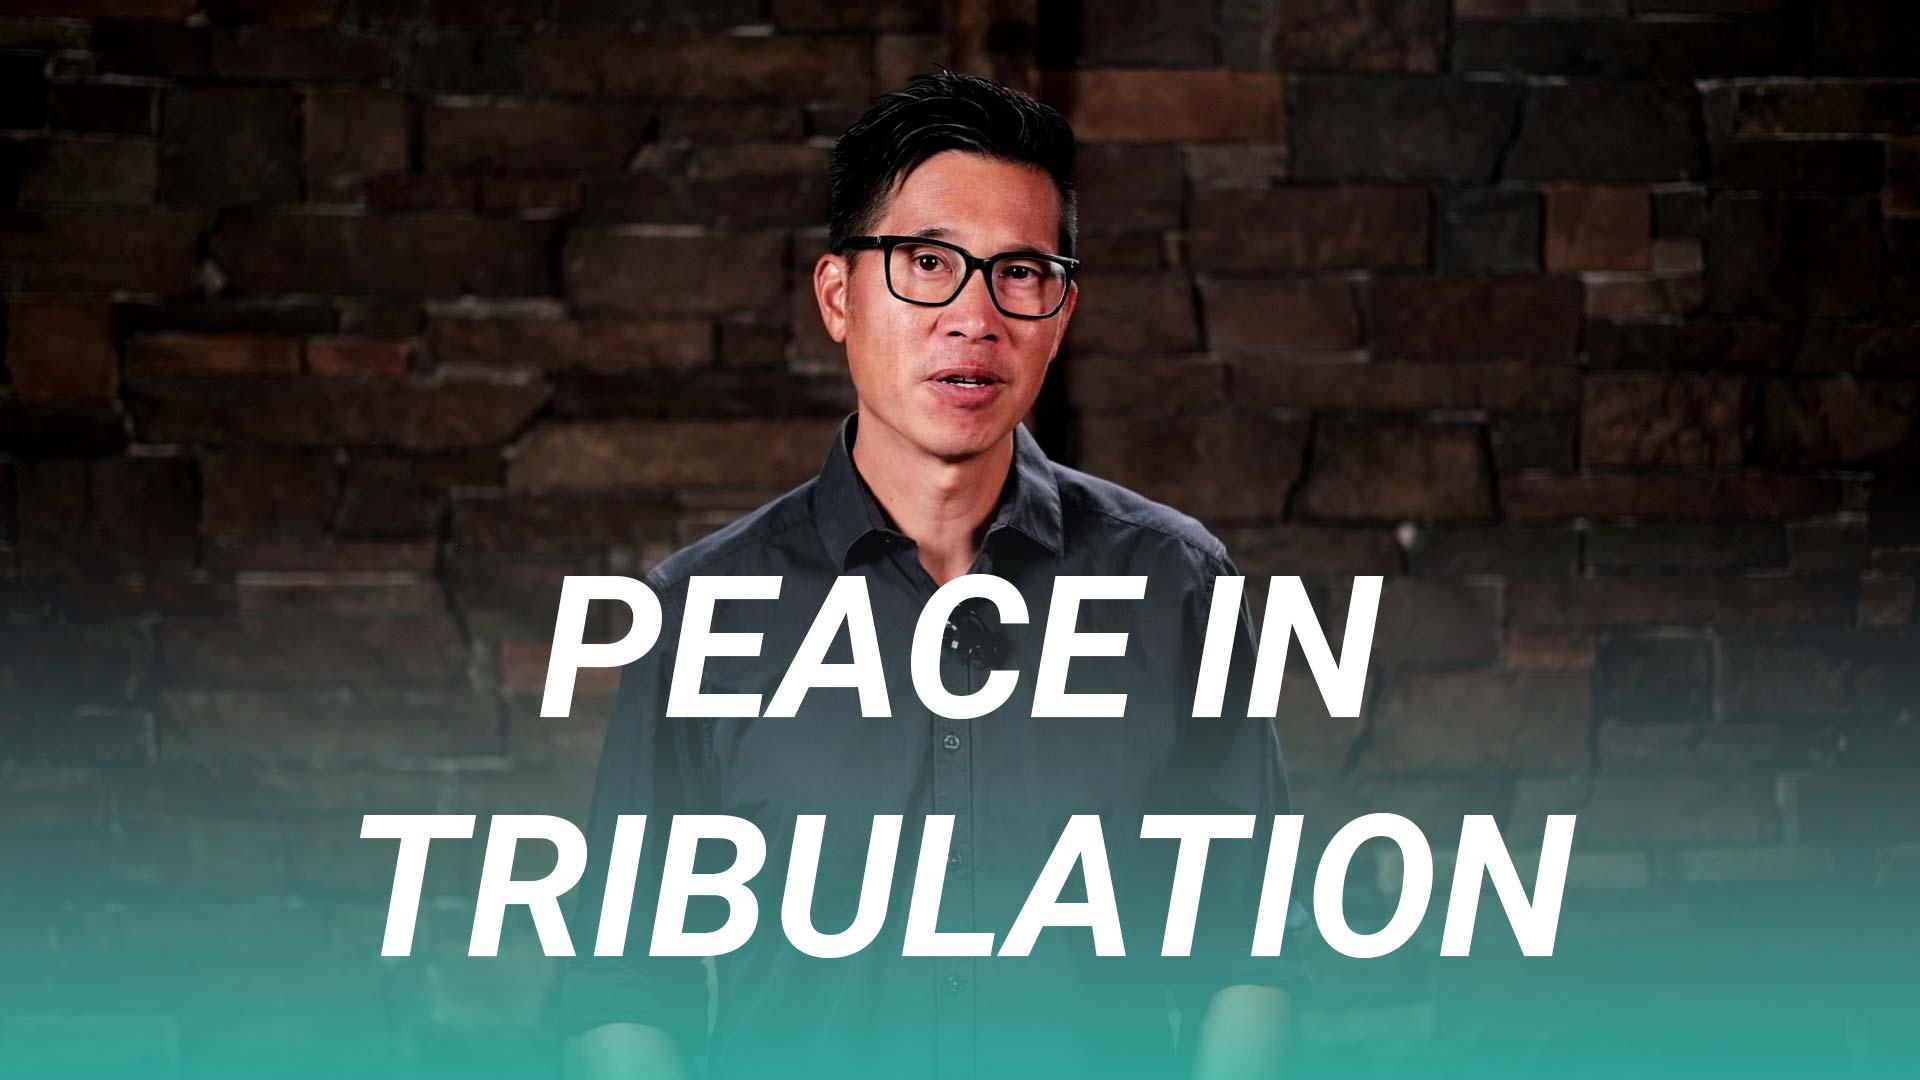 Peace in Tribulation (John 16:25-33)